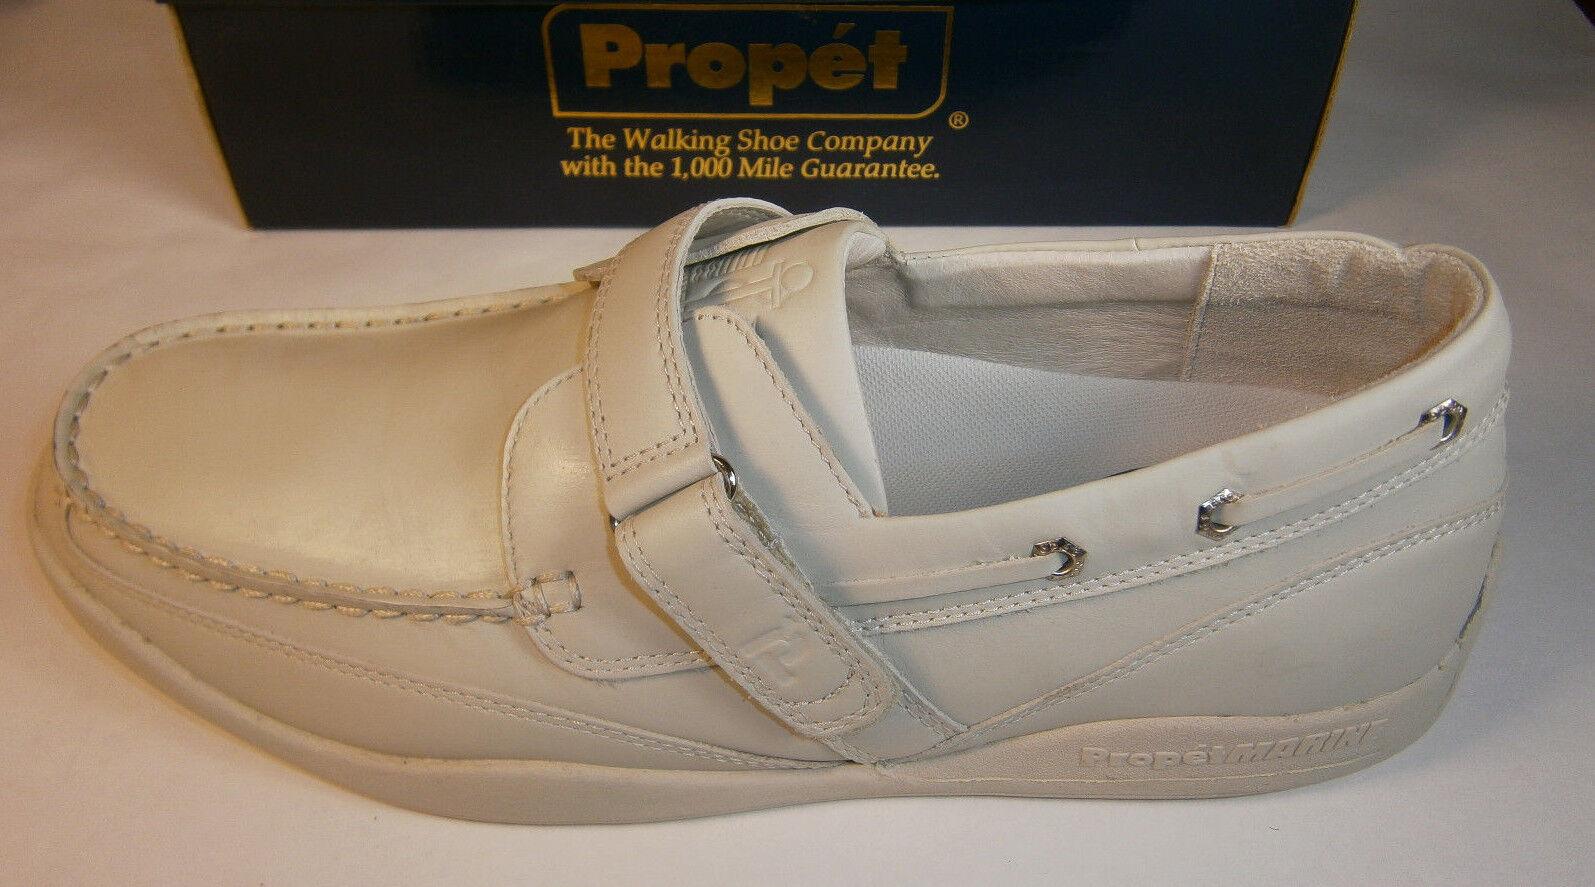 PROPET MARINE BEST BOAT SHOES LEATHER DIABETIC IVORY 8.5 9 10 SAILING WALKING